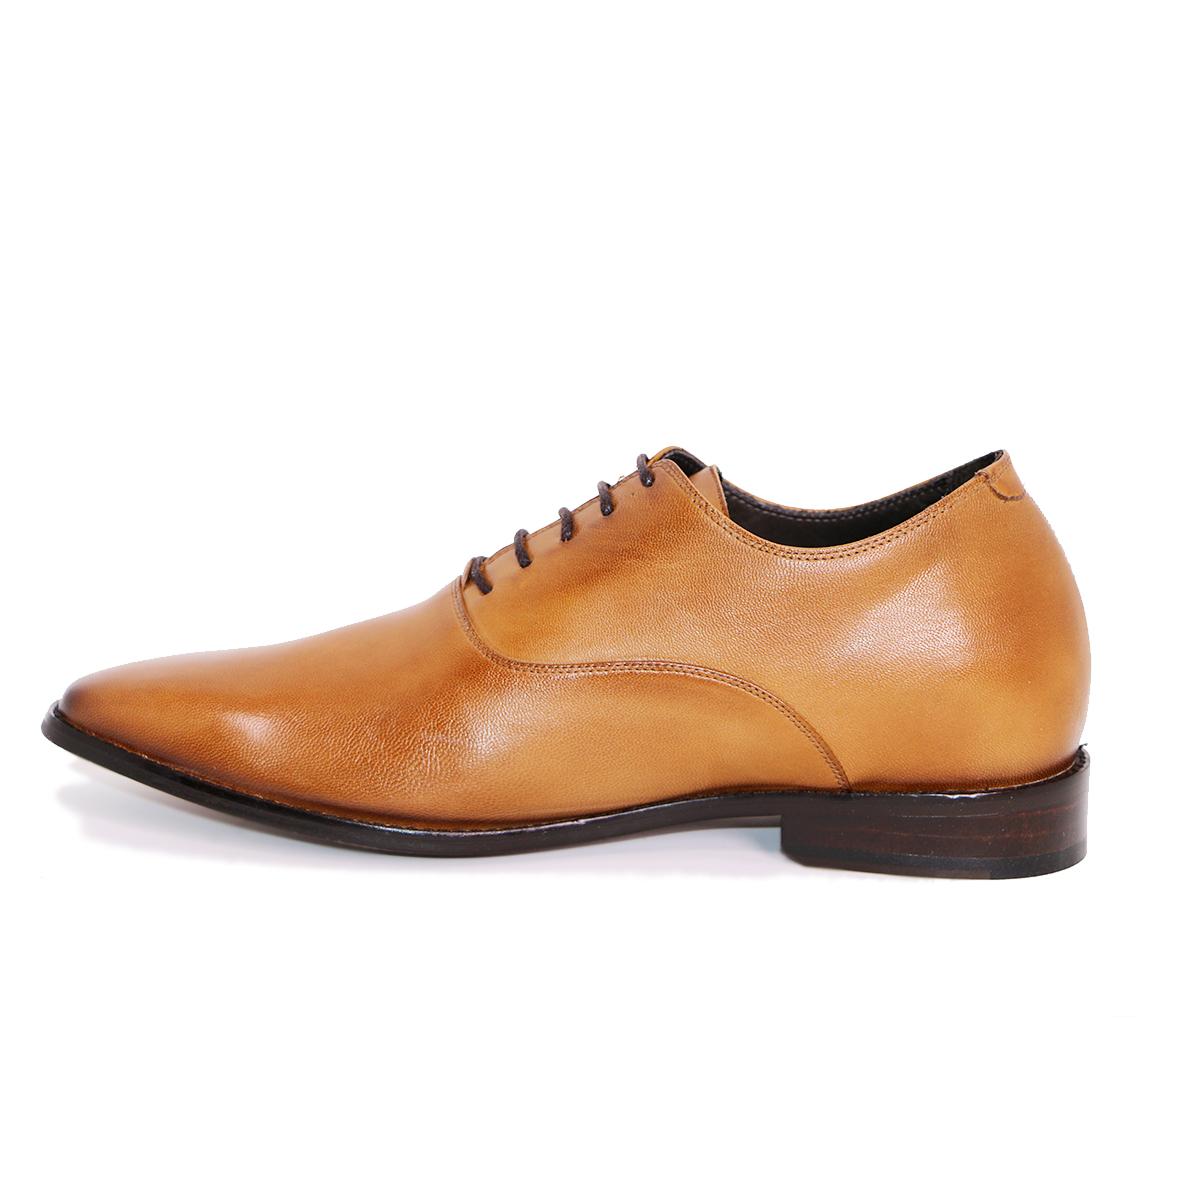 Zapato Formal Elegant Café Claro Max Denegri +7cm de Altura_72718